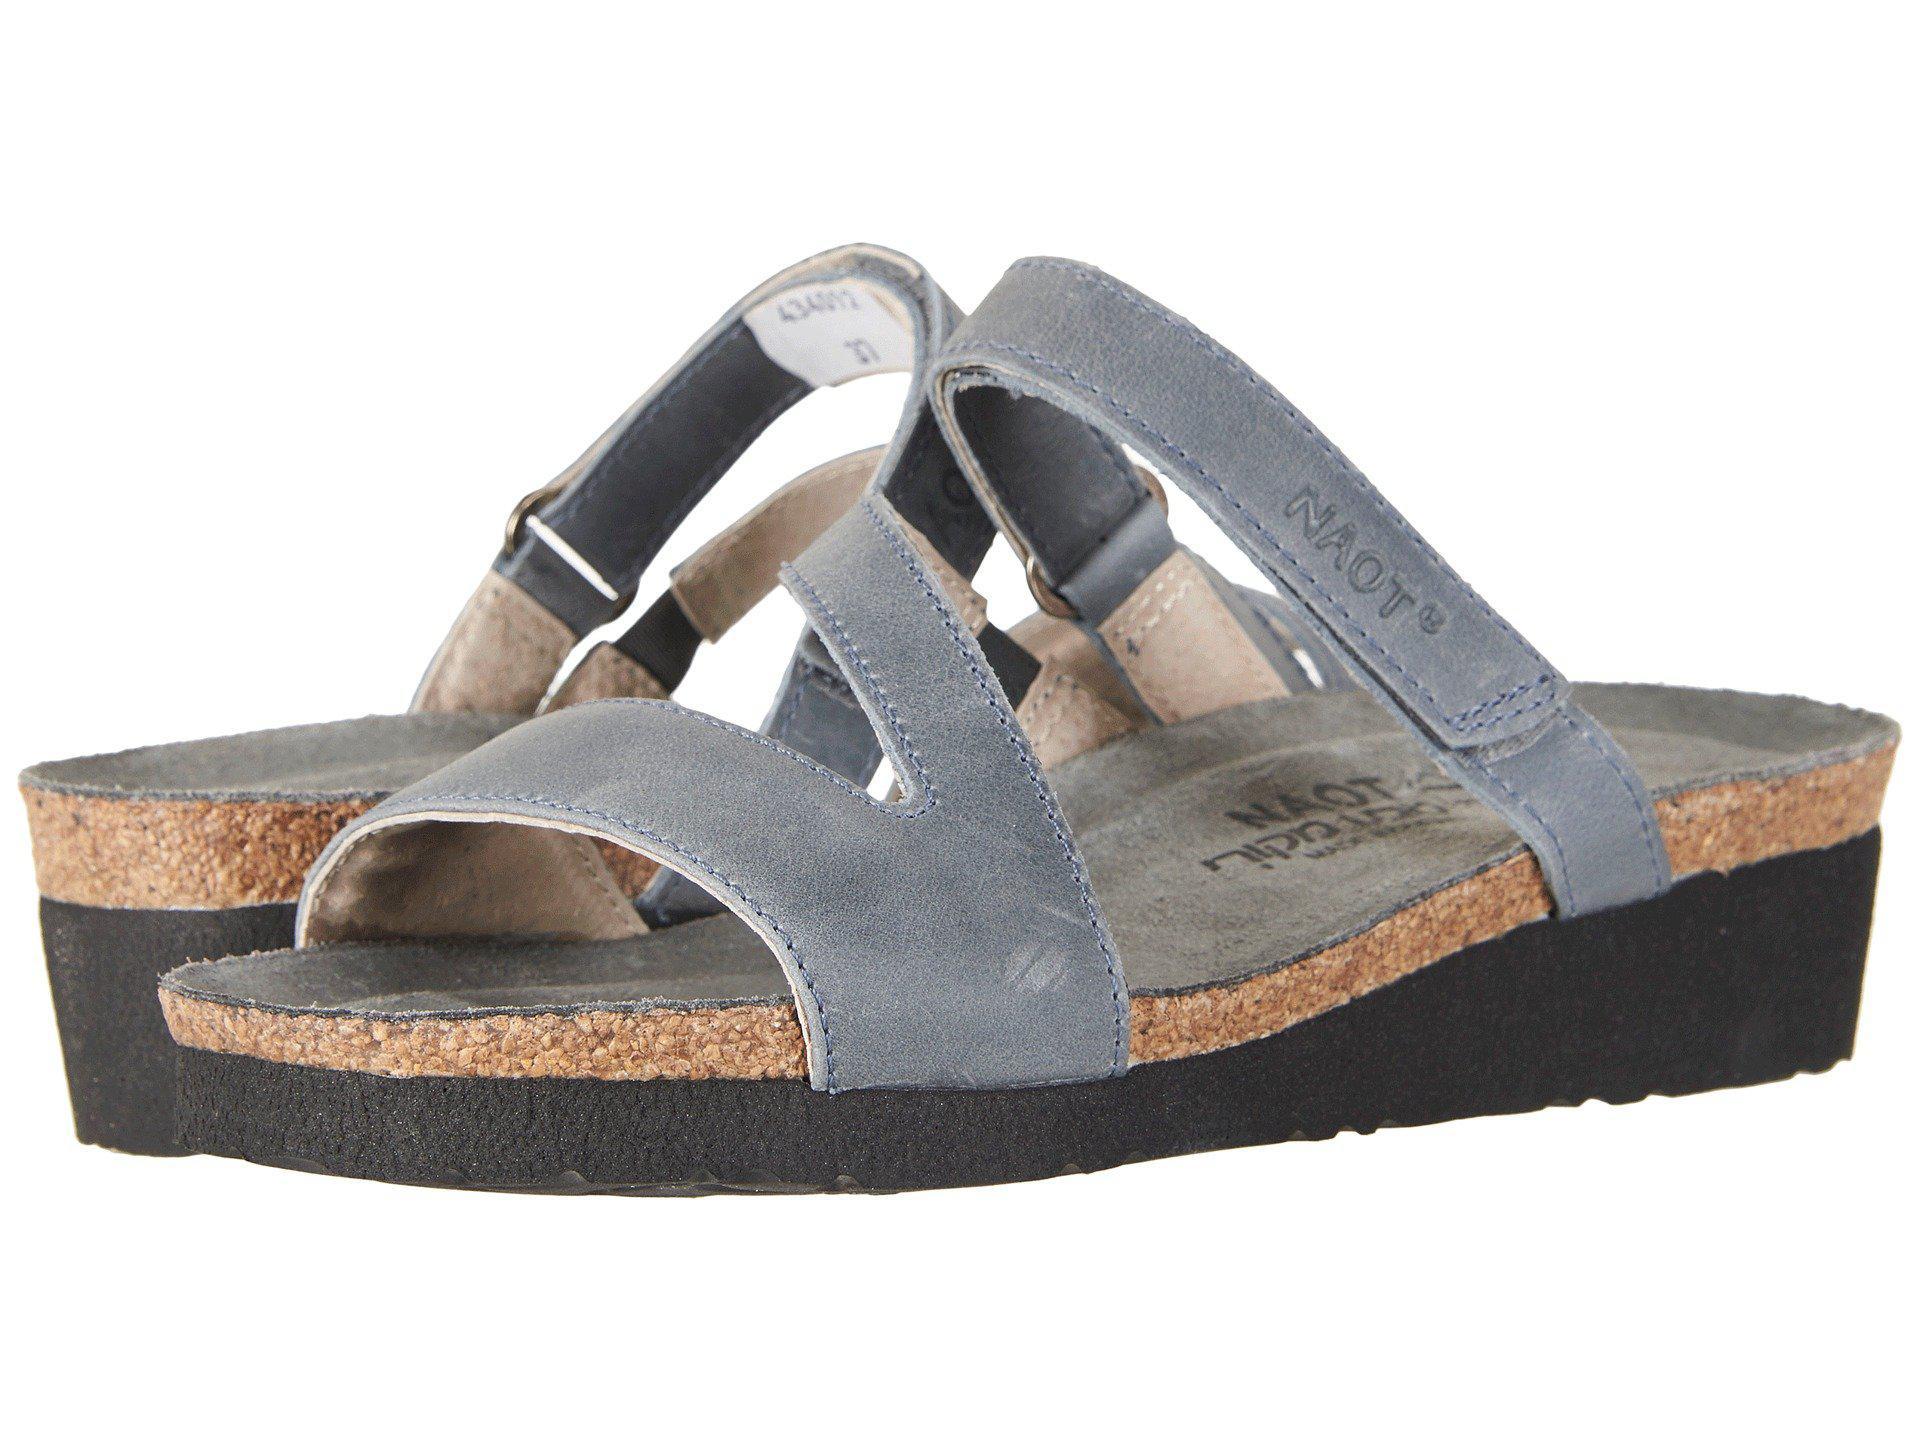 55907ccd420e76 Lyst - Naot Gabriela (oily Coal Nubuck) Women s Shoes in Gray